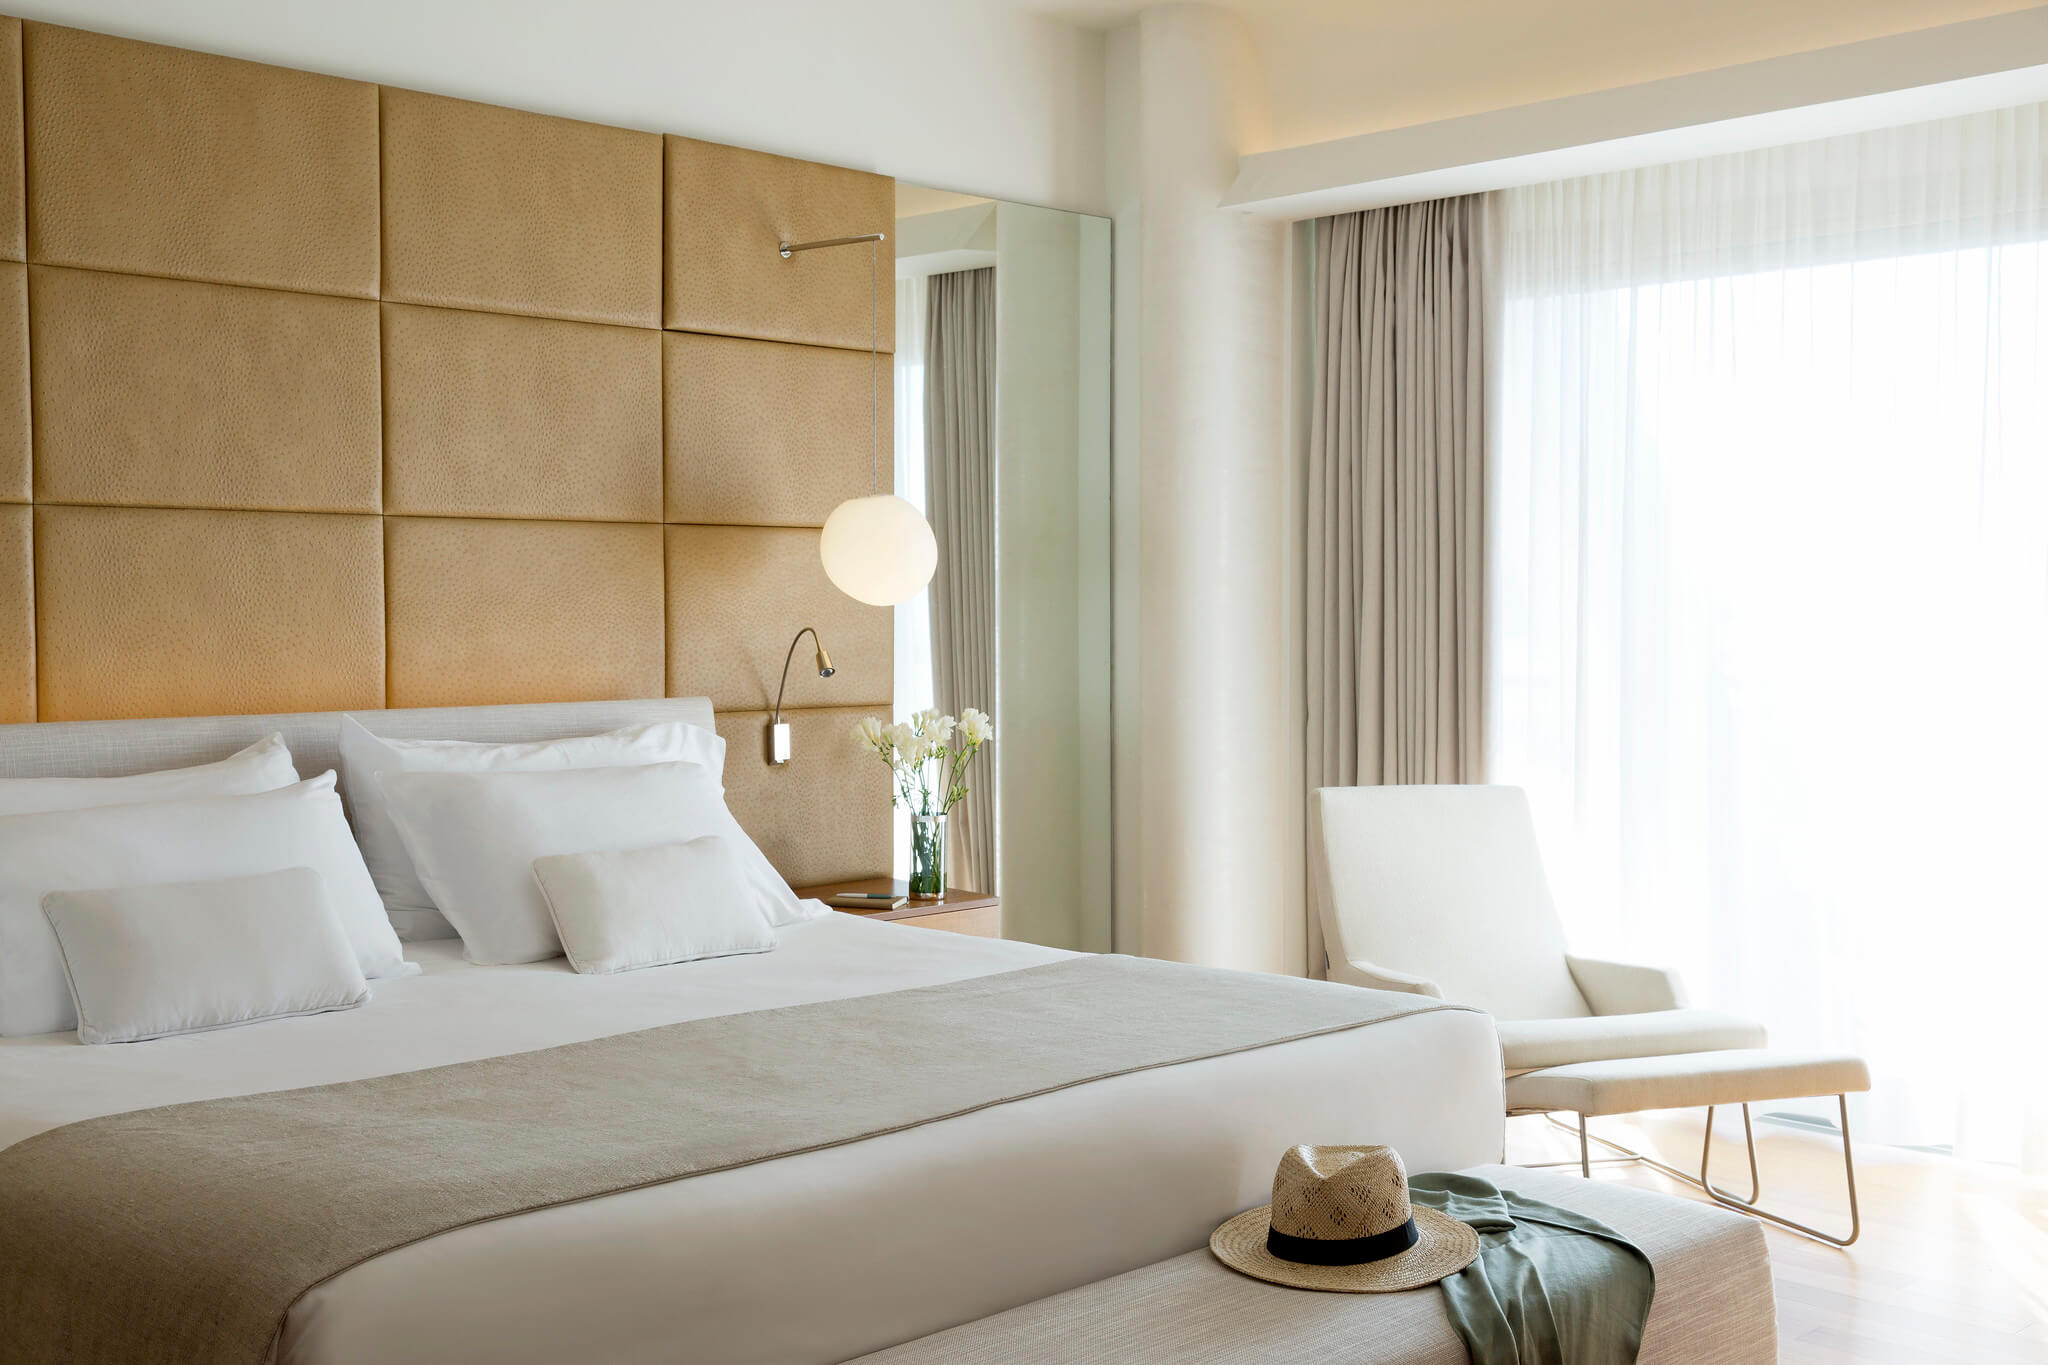 https://www.white-ibiza.com/wp-content/uploads/2020/02/white-ibiza-hotels-ibiza-gran-hotel-2020-11.jpg